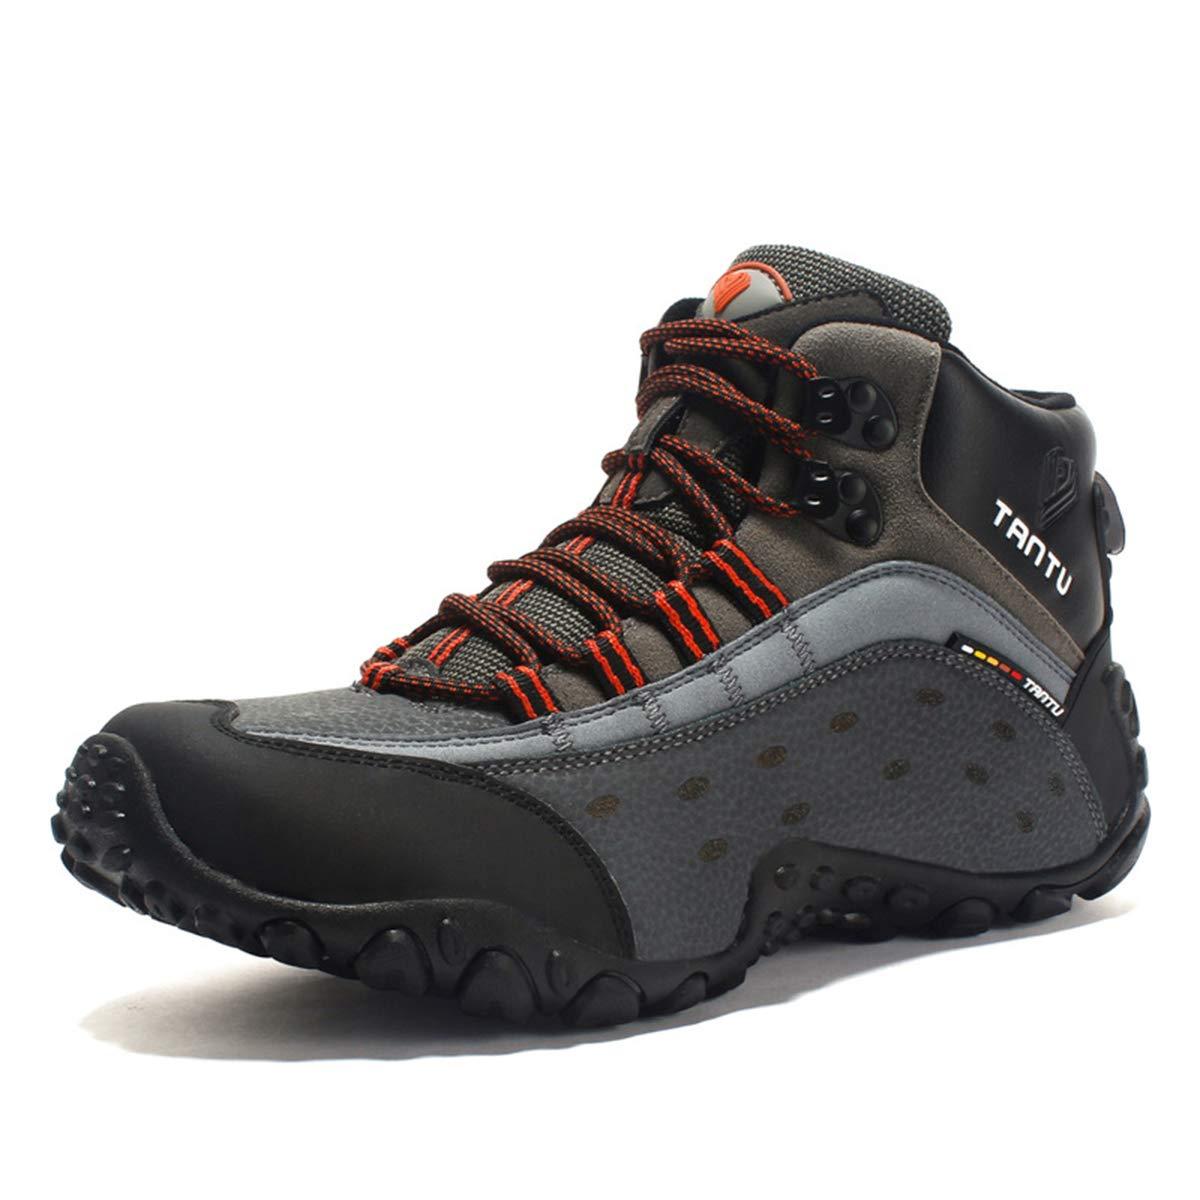 A  MERRYHE Chaussures d'escalade pour Hommes Chaussures de Sport en Plein air Trekking Chaussures de randonnée Chaussures d'alpinisme pour Camping Chaussures d'escalade de Cross-Country